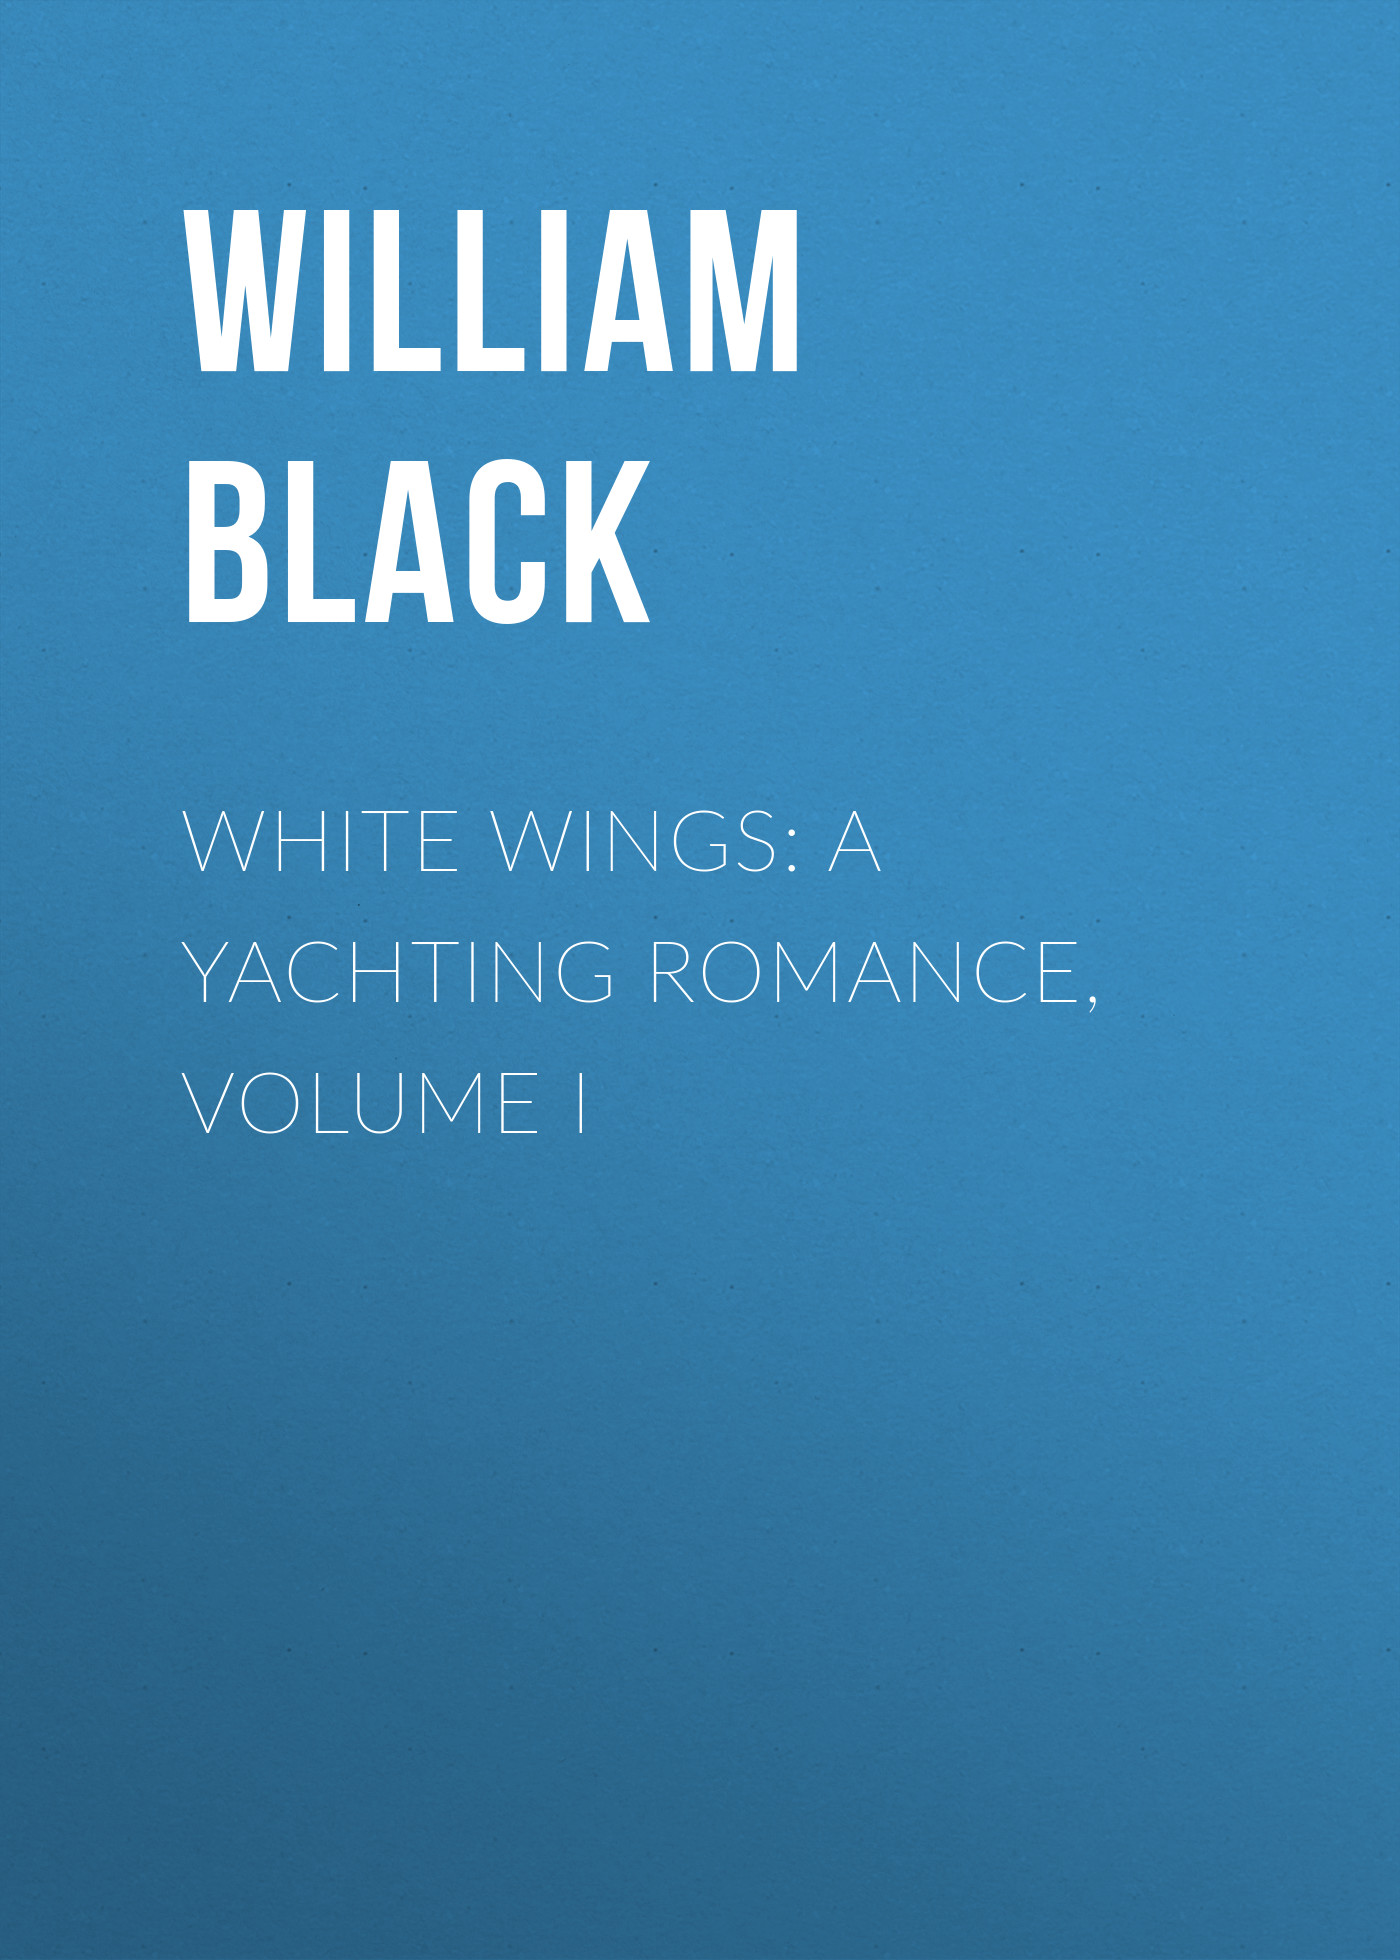 Black William White Wings: A Yachting Romance, Volume I niko white black font 1 volume